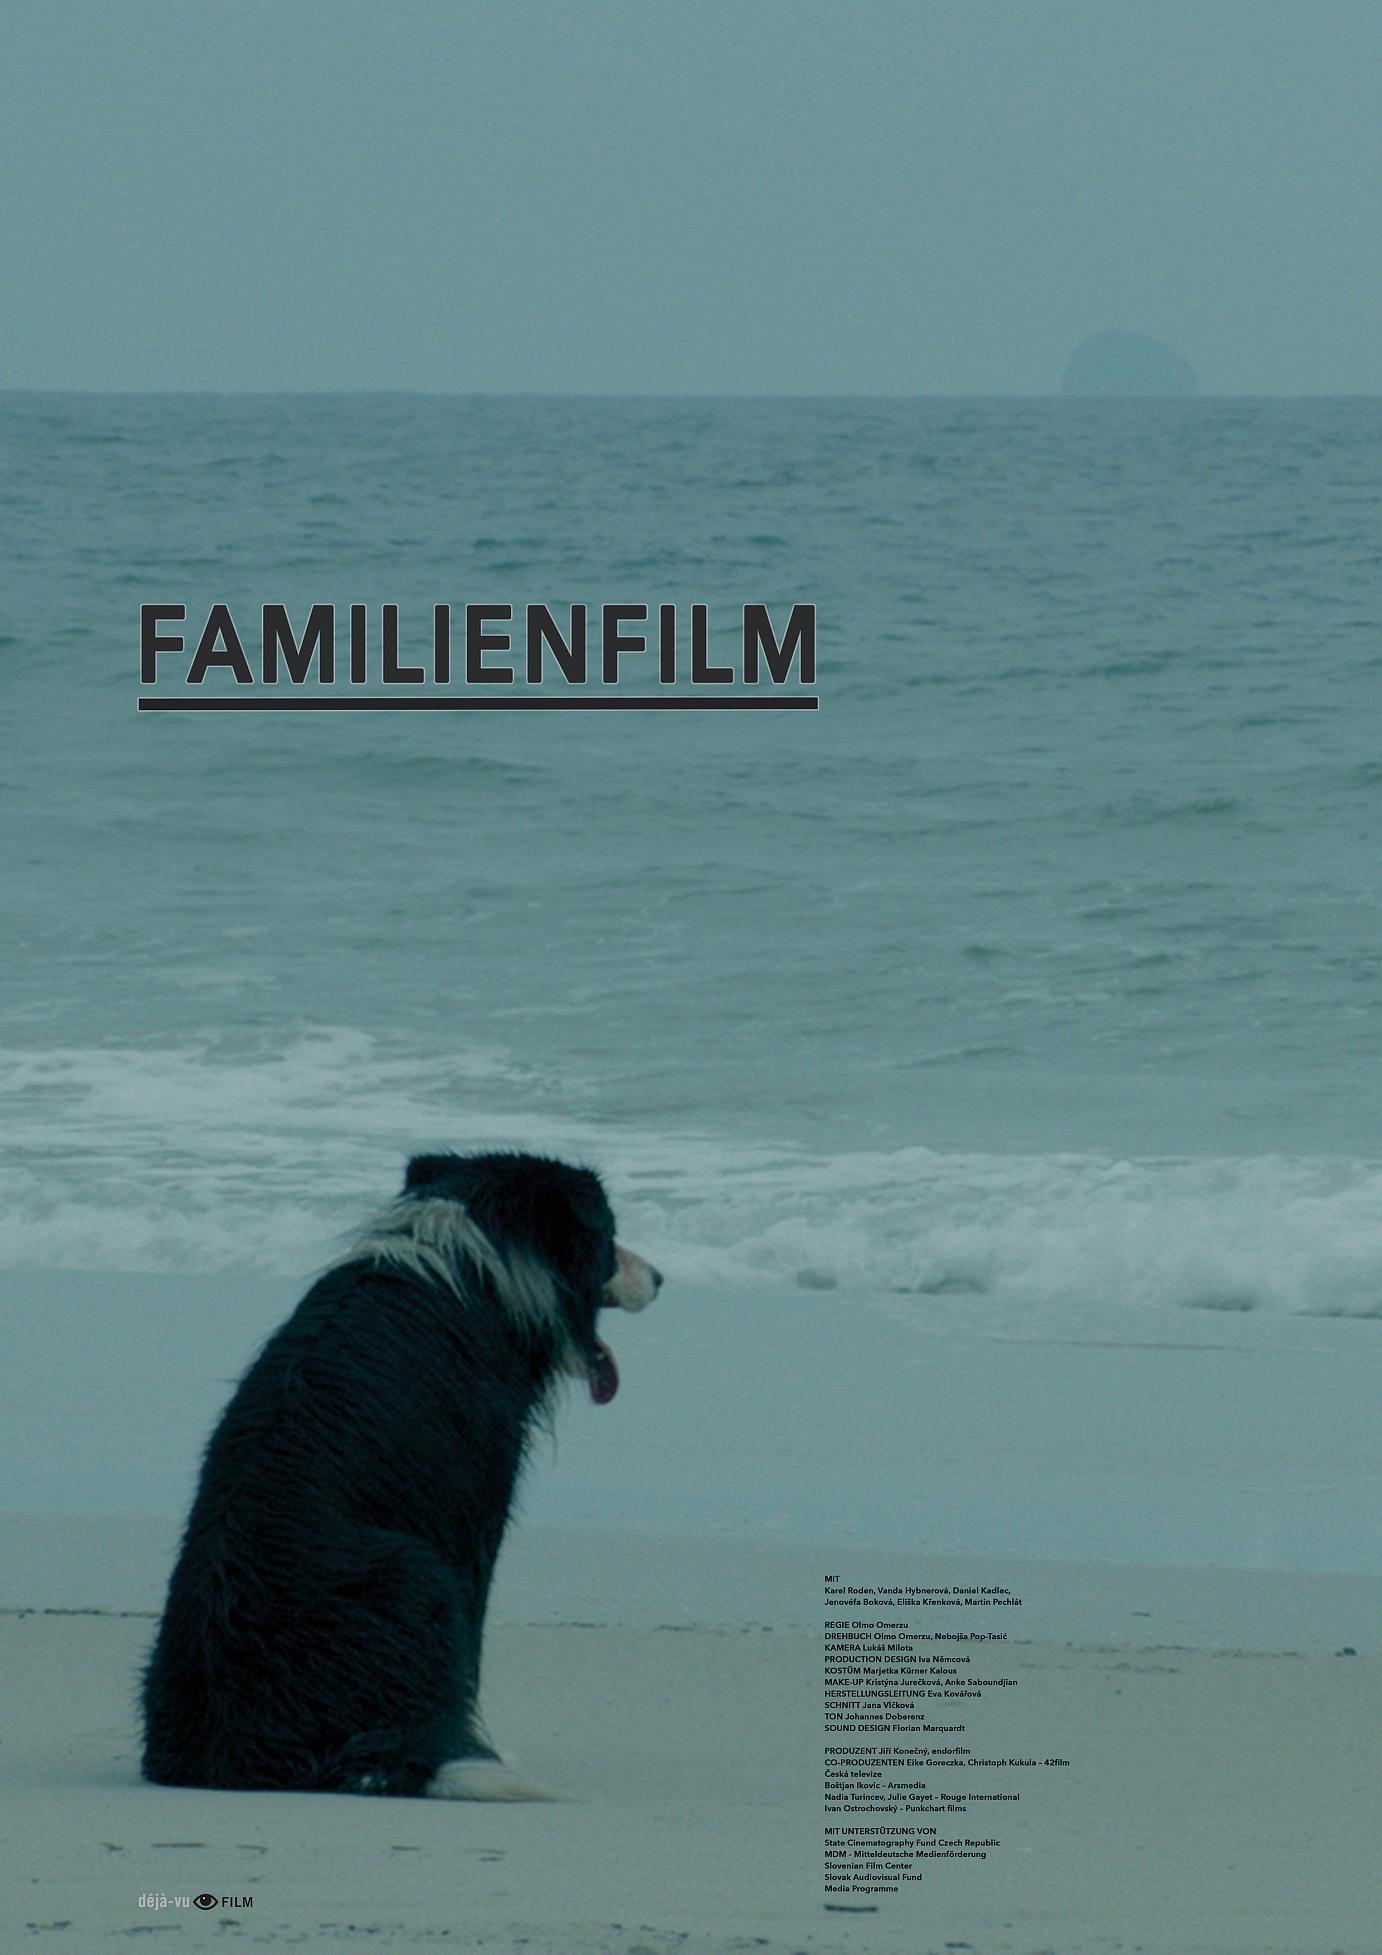 Filmbewertung Kinofilme